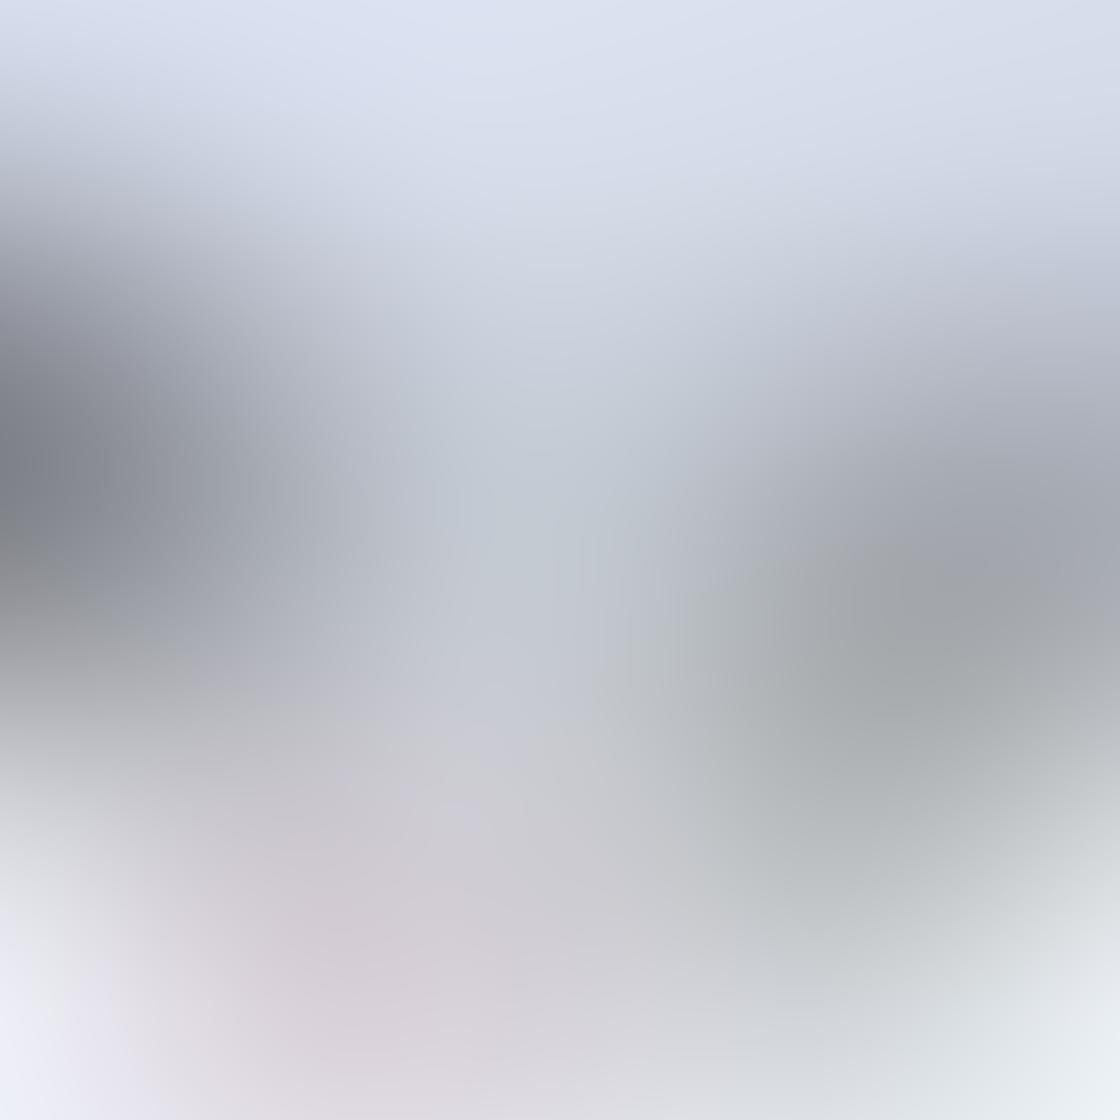 iPhone Photography Snow 121